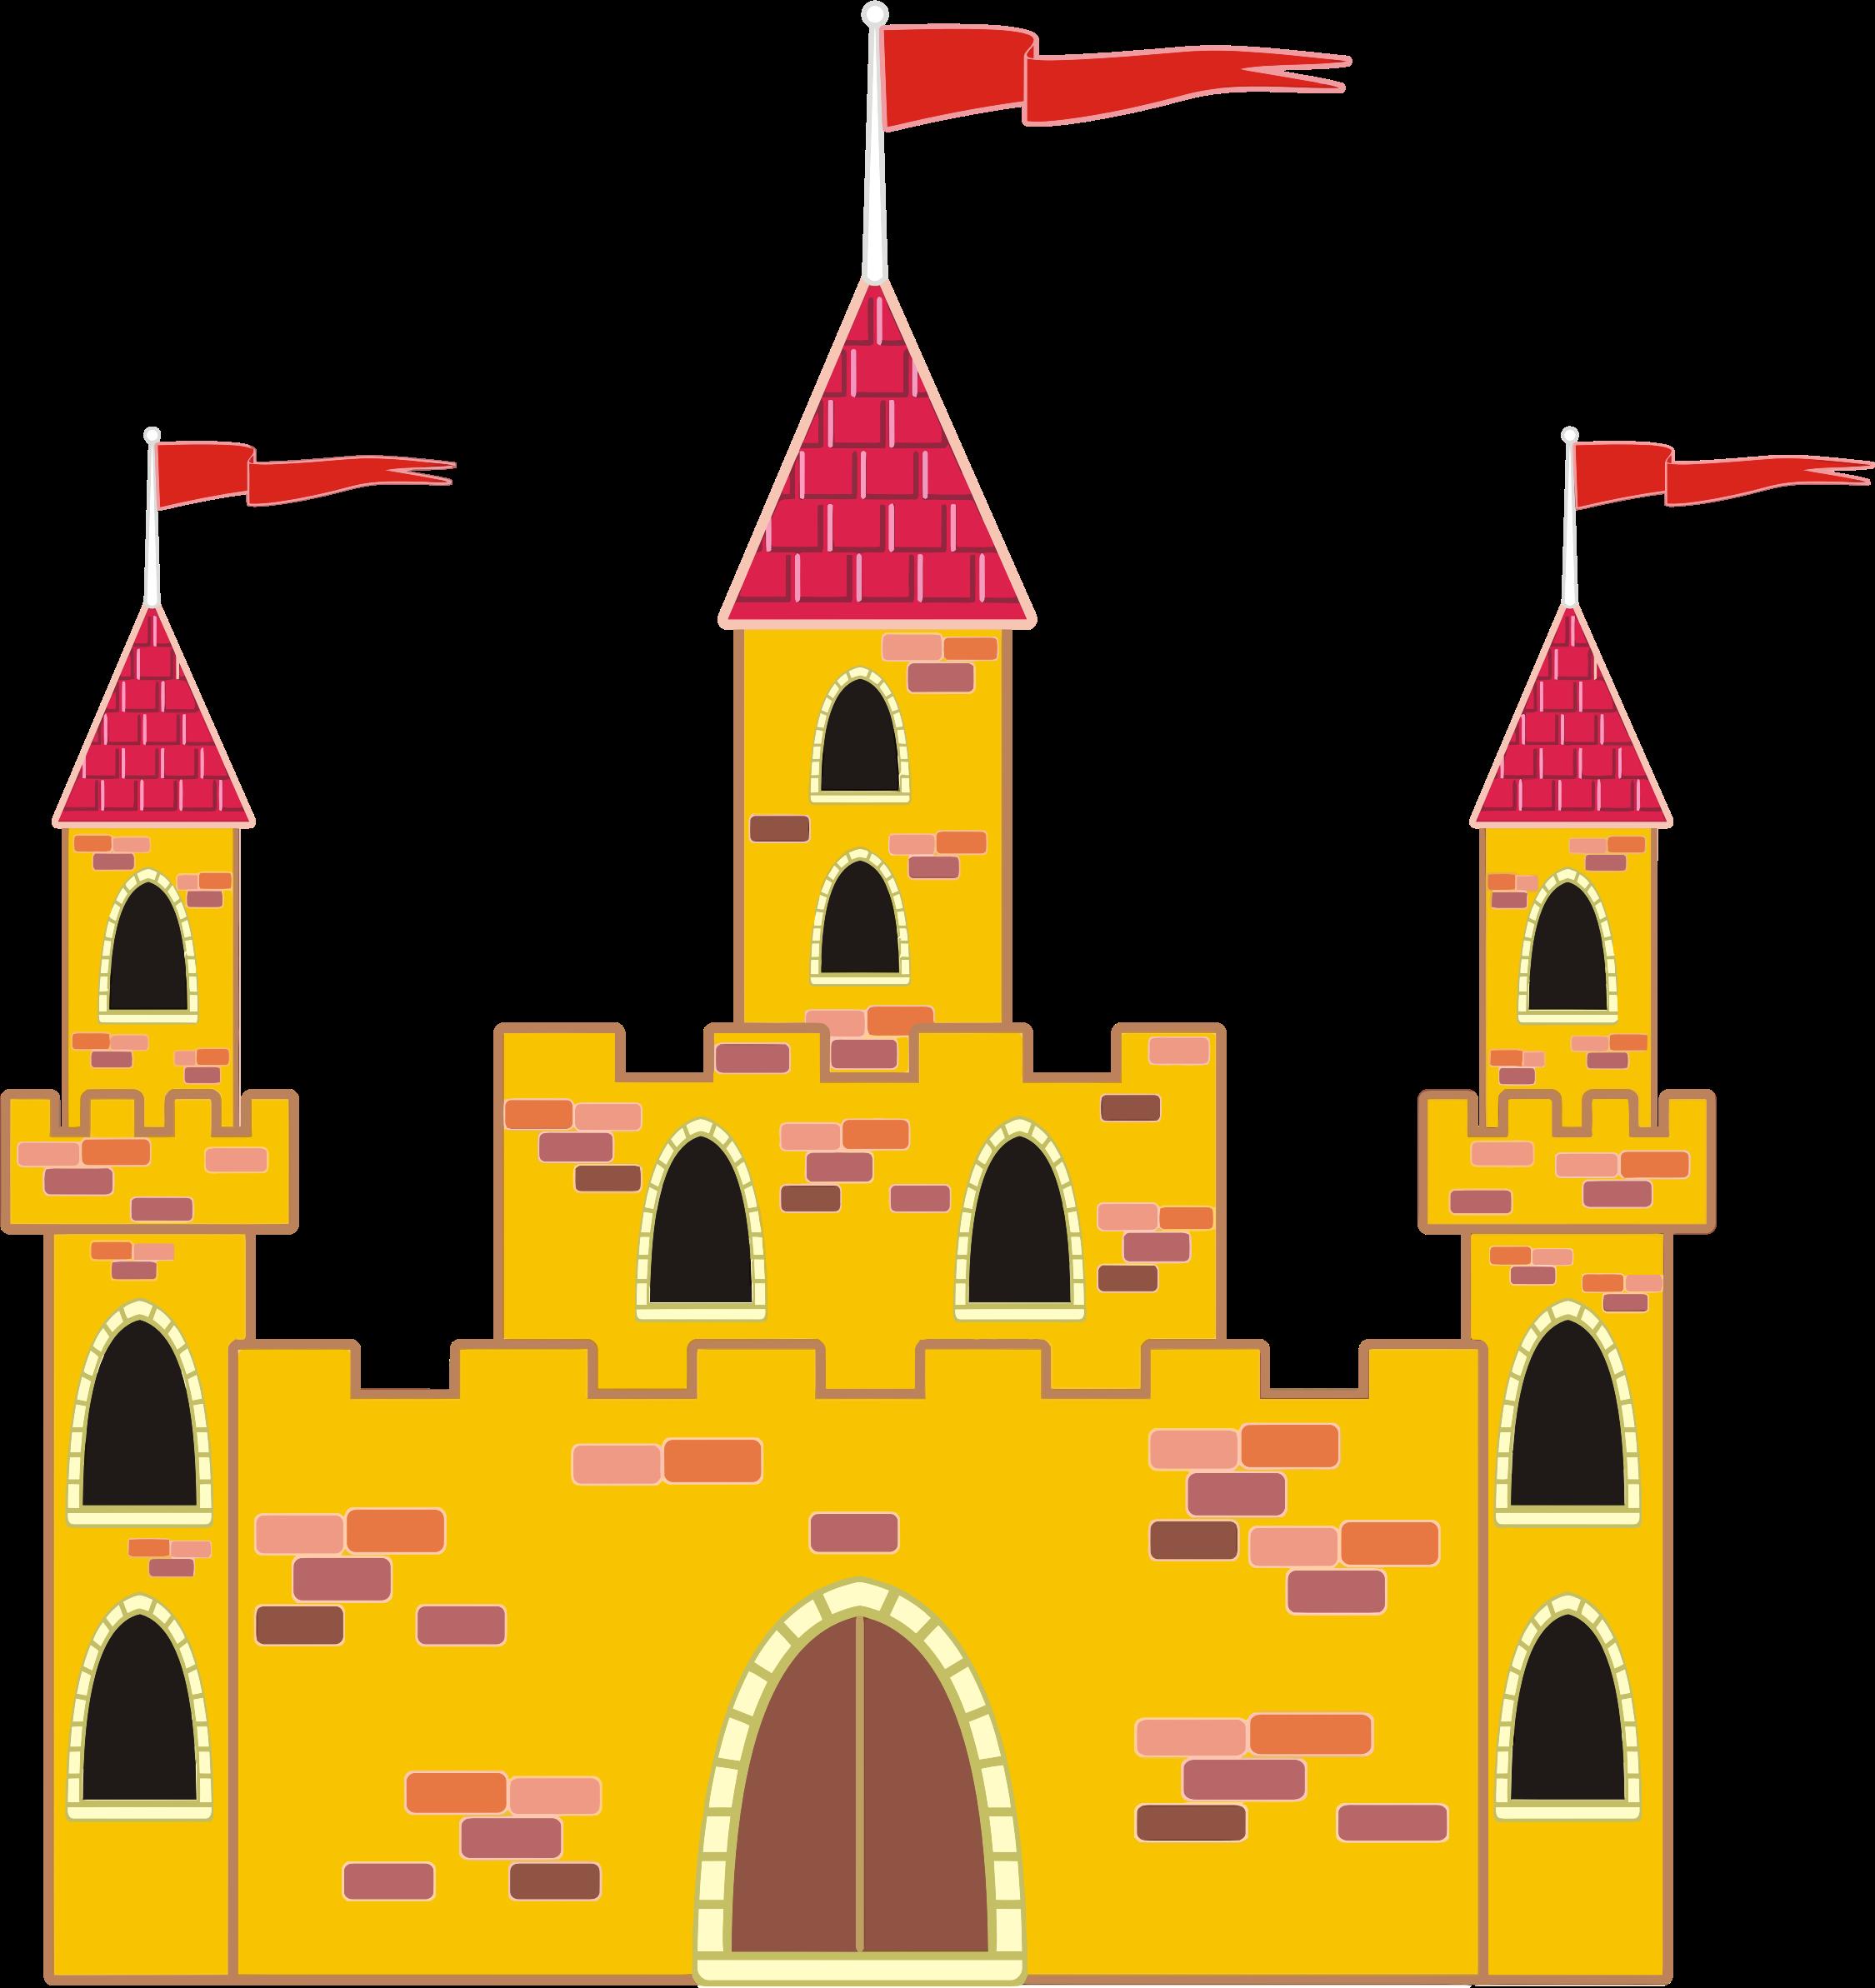 Palace clipart amazing. Colorful medieval castle big